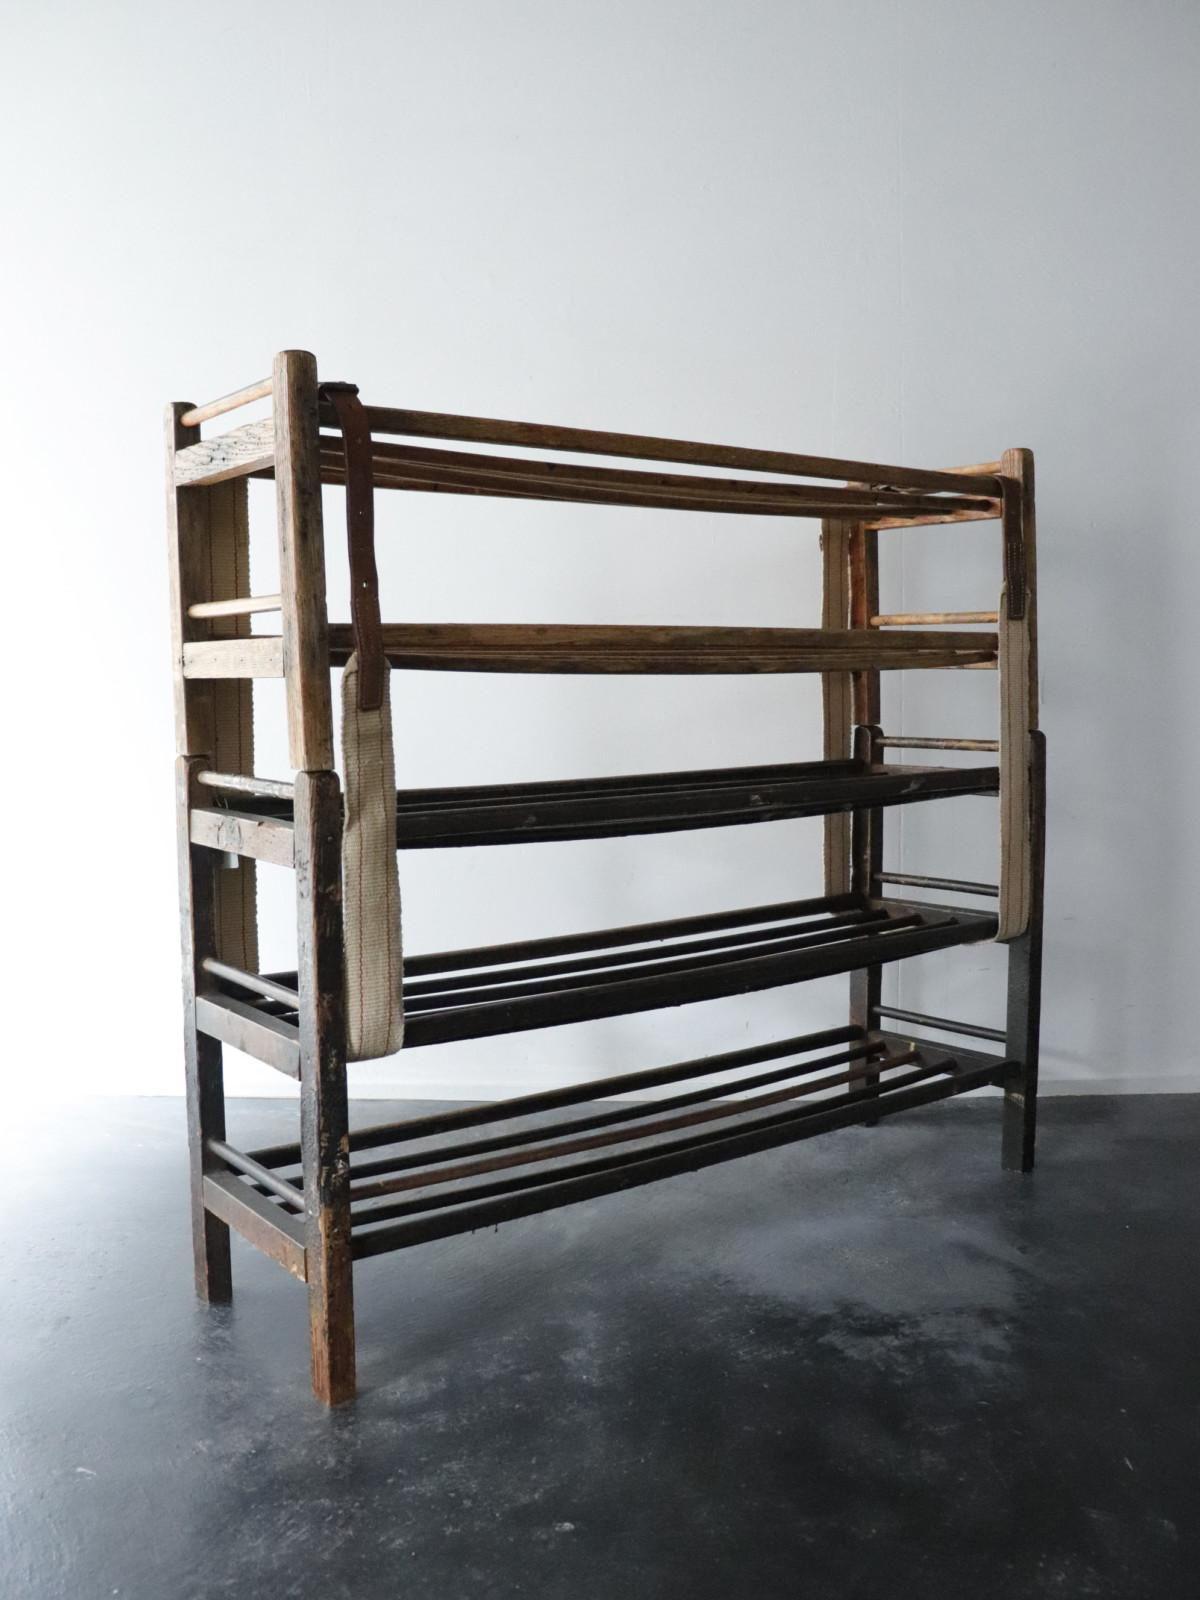 wood shoes rack, USA,vintage